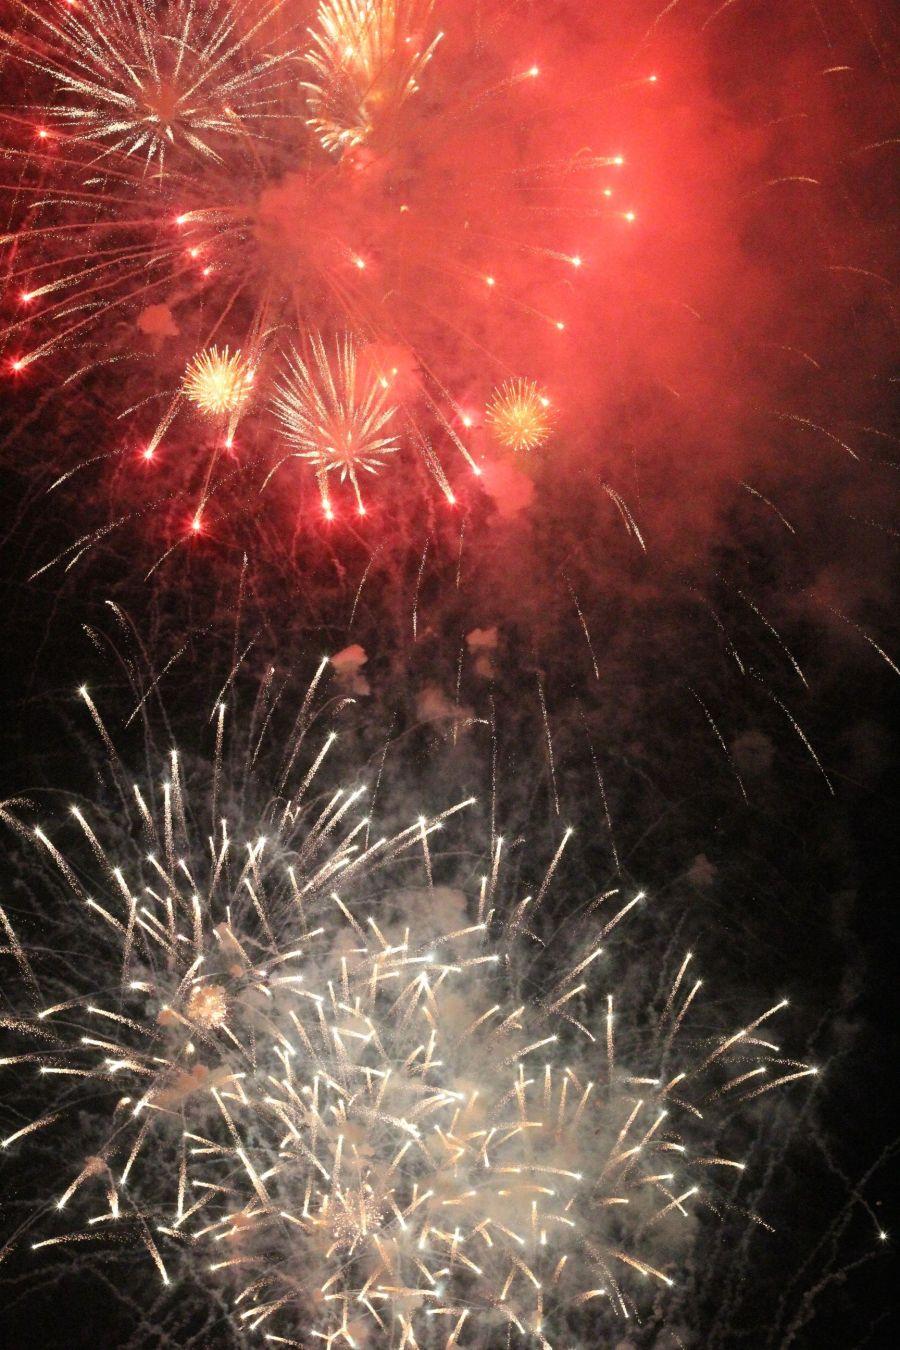 cambridge charles river fireworks 19